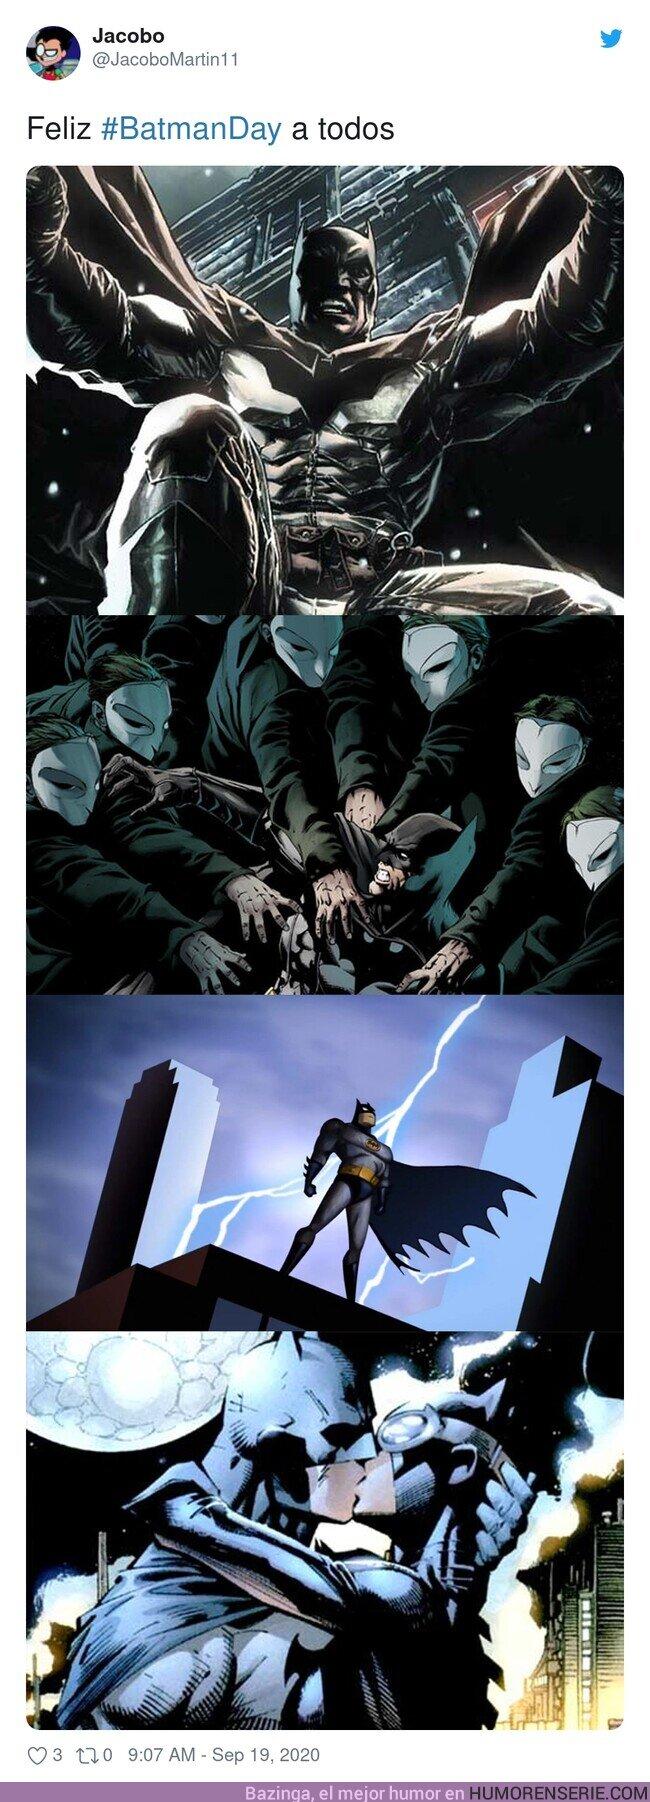 57879 - Feliz BatmanDay de los comics, por @JacoboMartin11